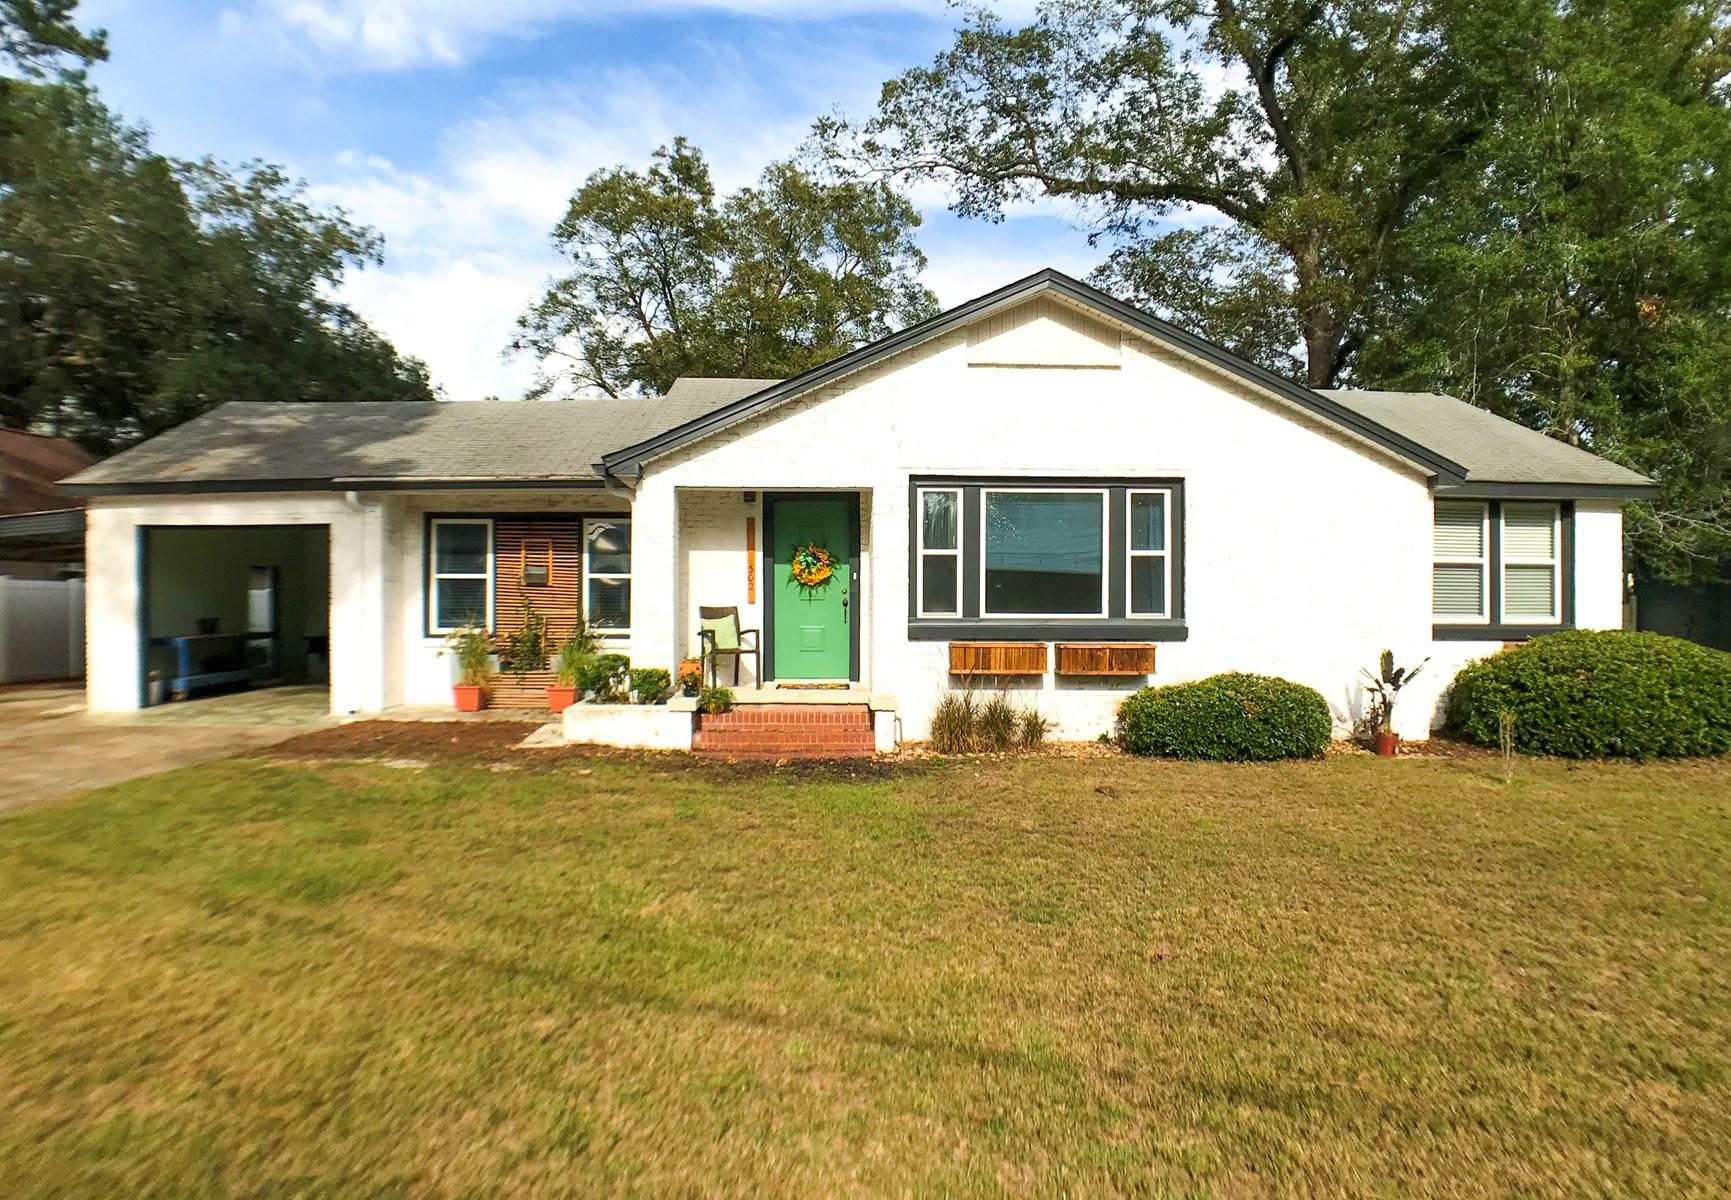 3B/2B home for sale Geneva, Alabama